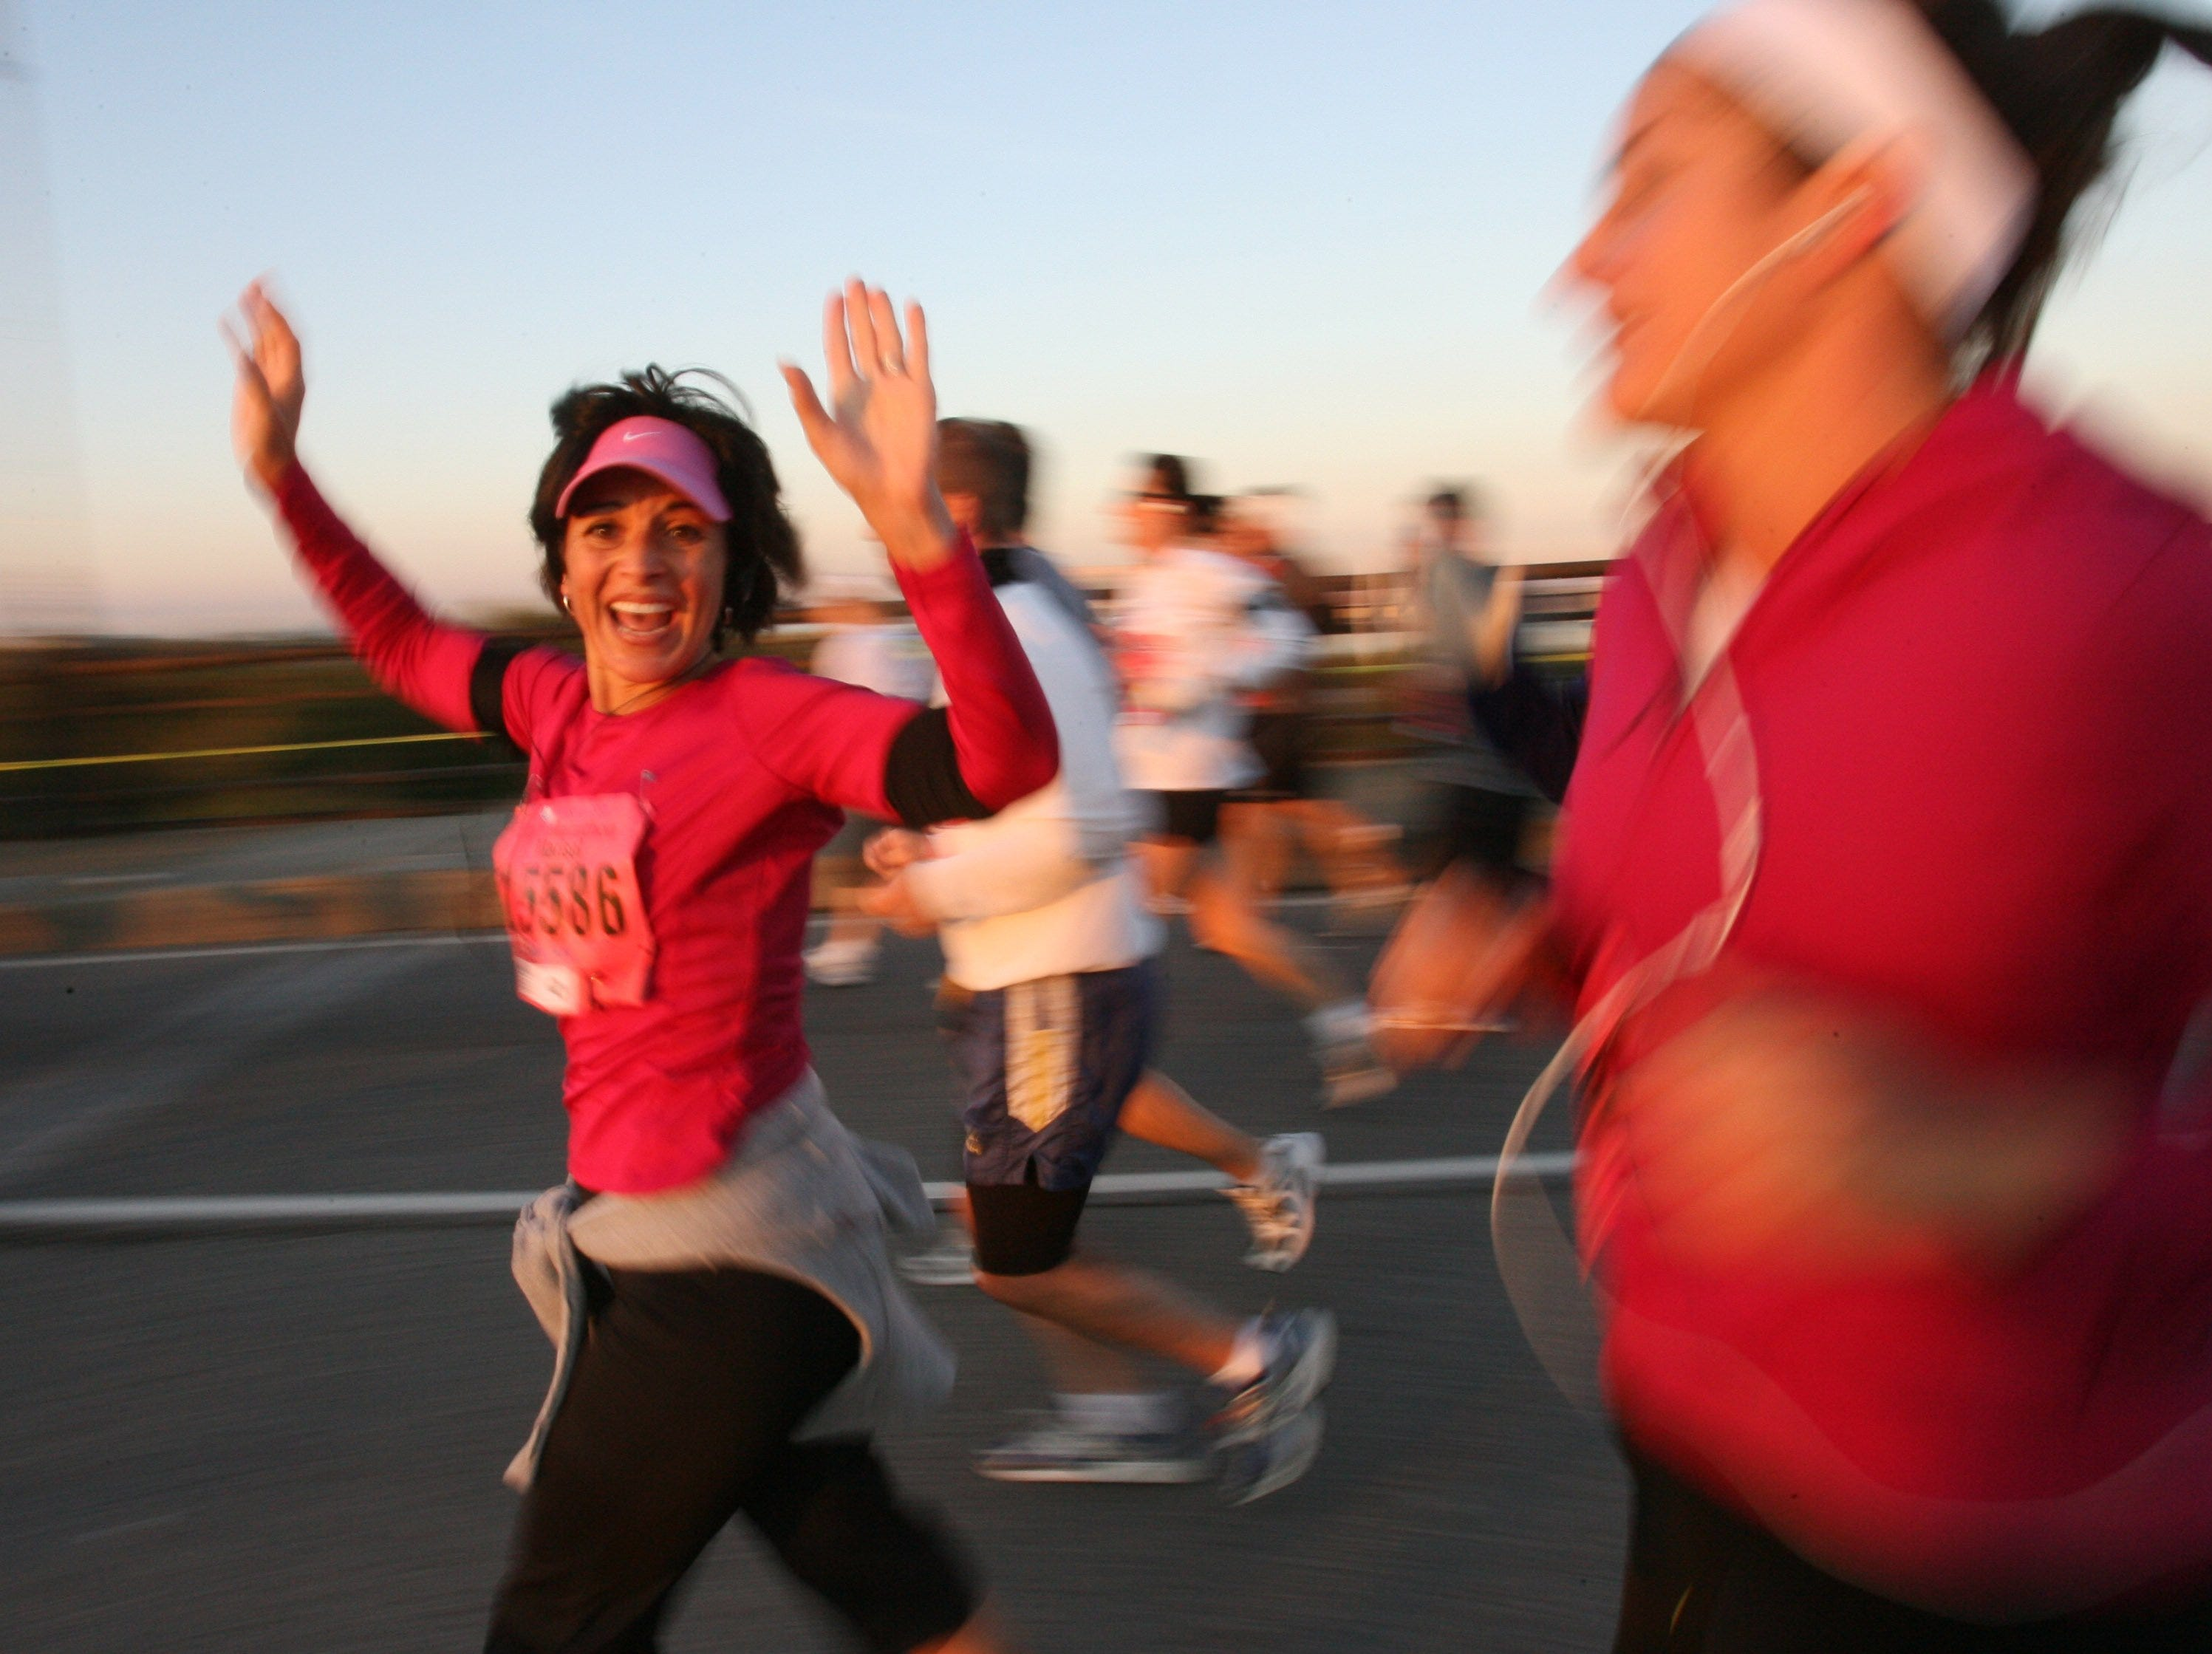 Marisol McCormick, 34, of Howell turns and waves on the Ambassador Bridge Sunday October 19, 2008 during the Detroit Free Press/Flagstar Marathon.